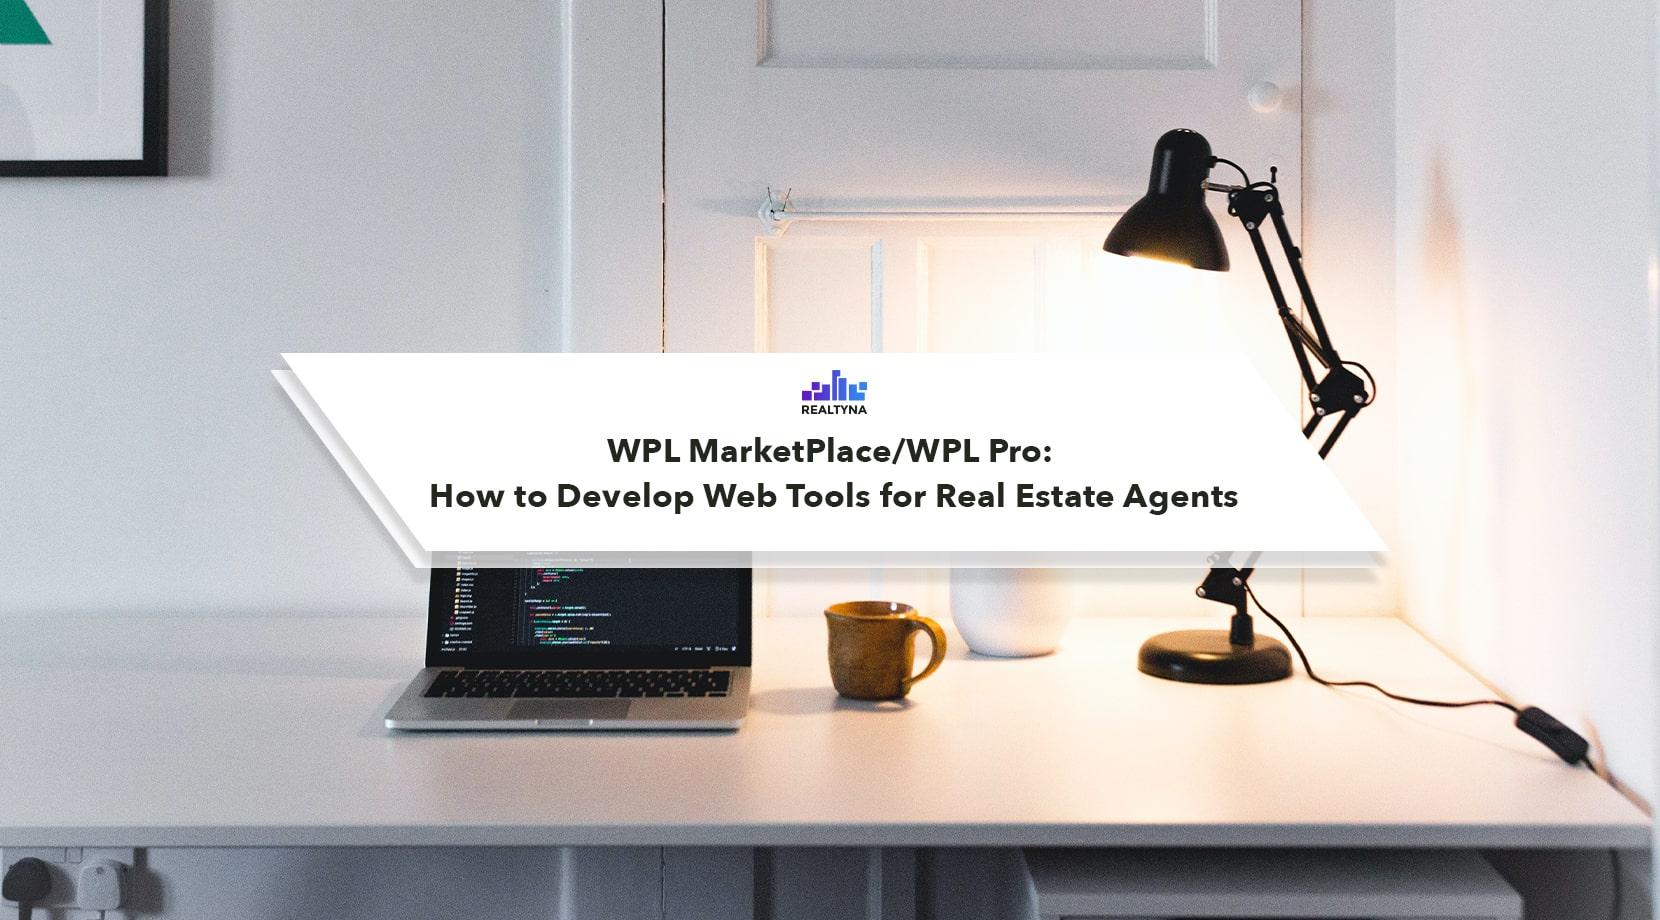 WPL MarketPlace